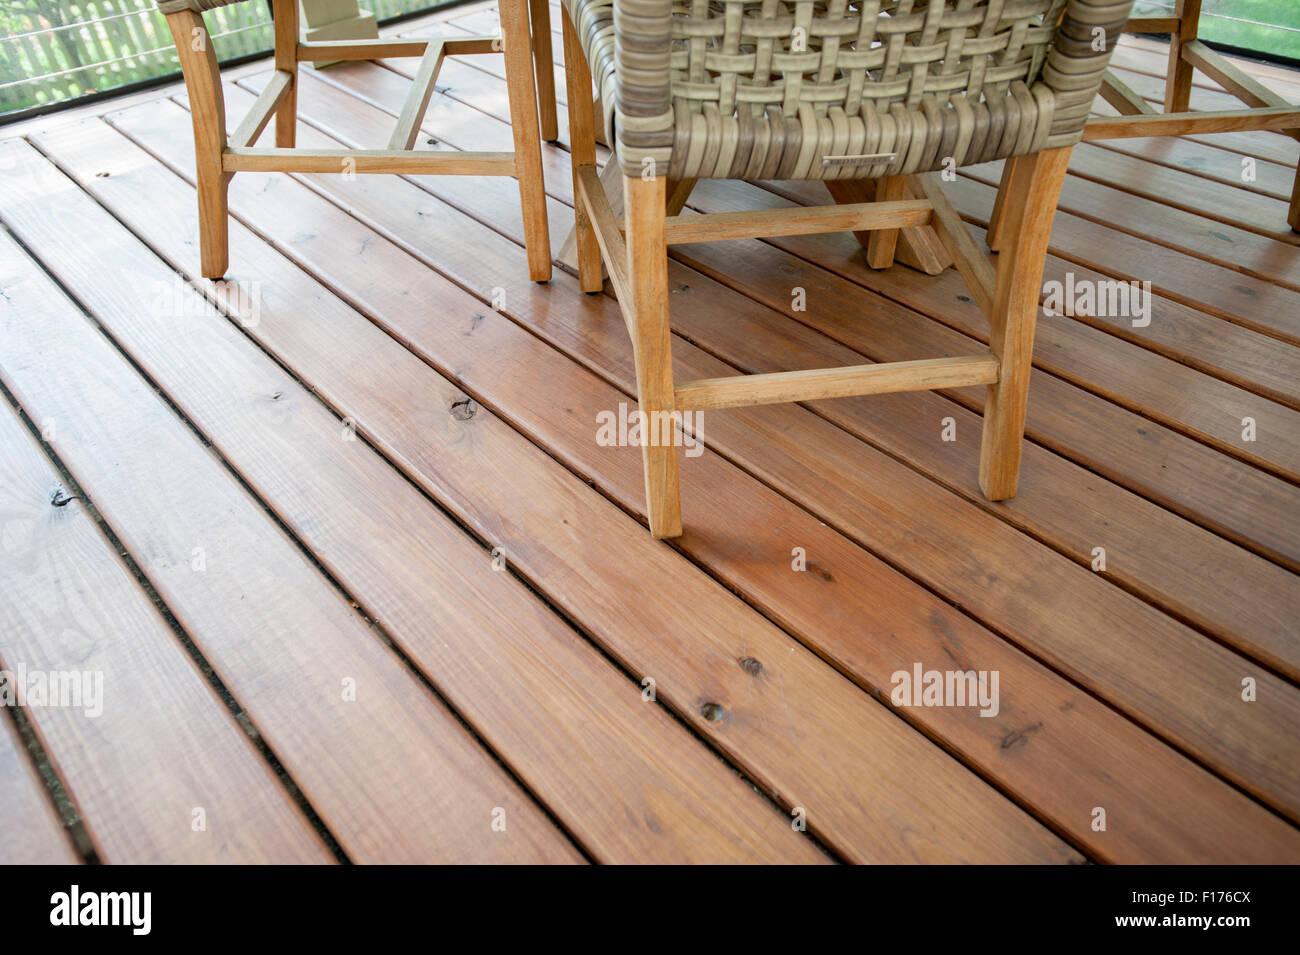 Uitgelezene Holzboden Dielen Planken in einem abgeschirmten Veranda in UP-25